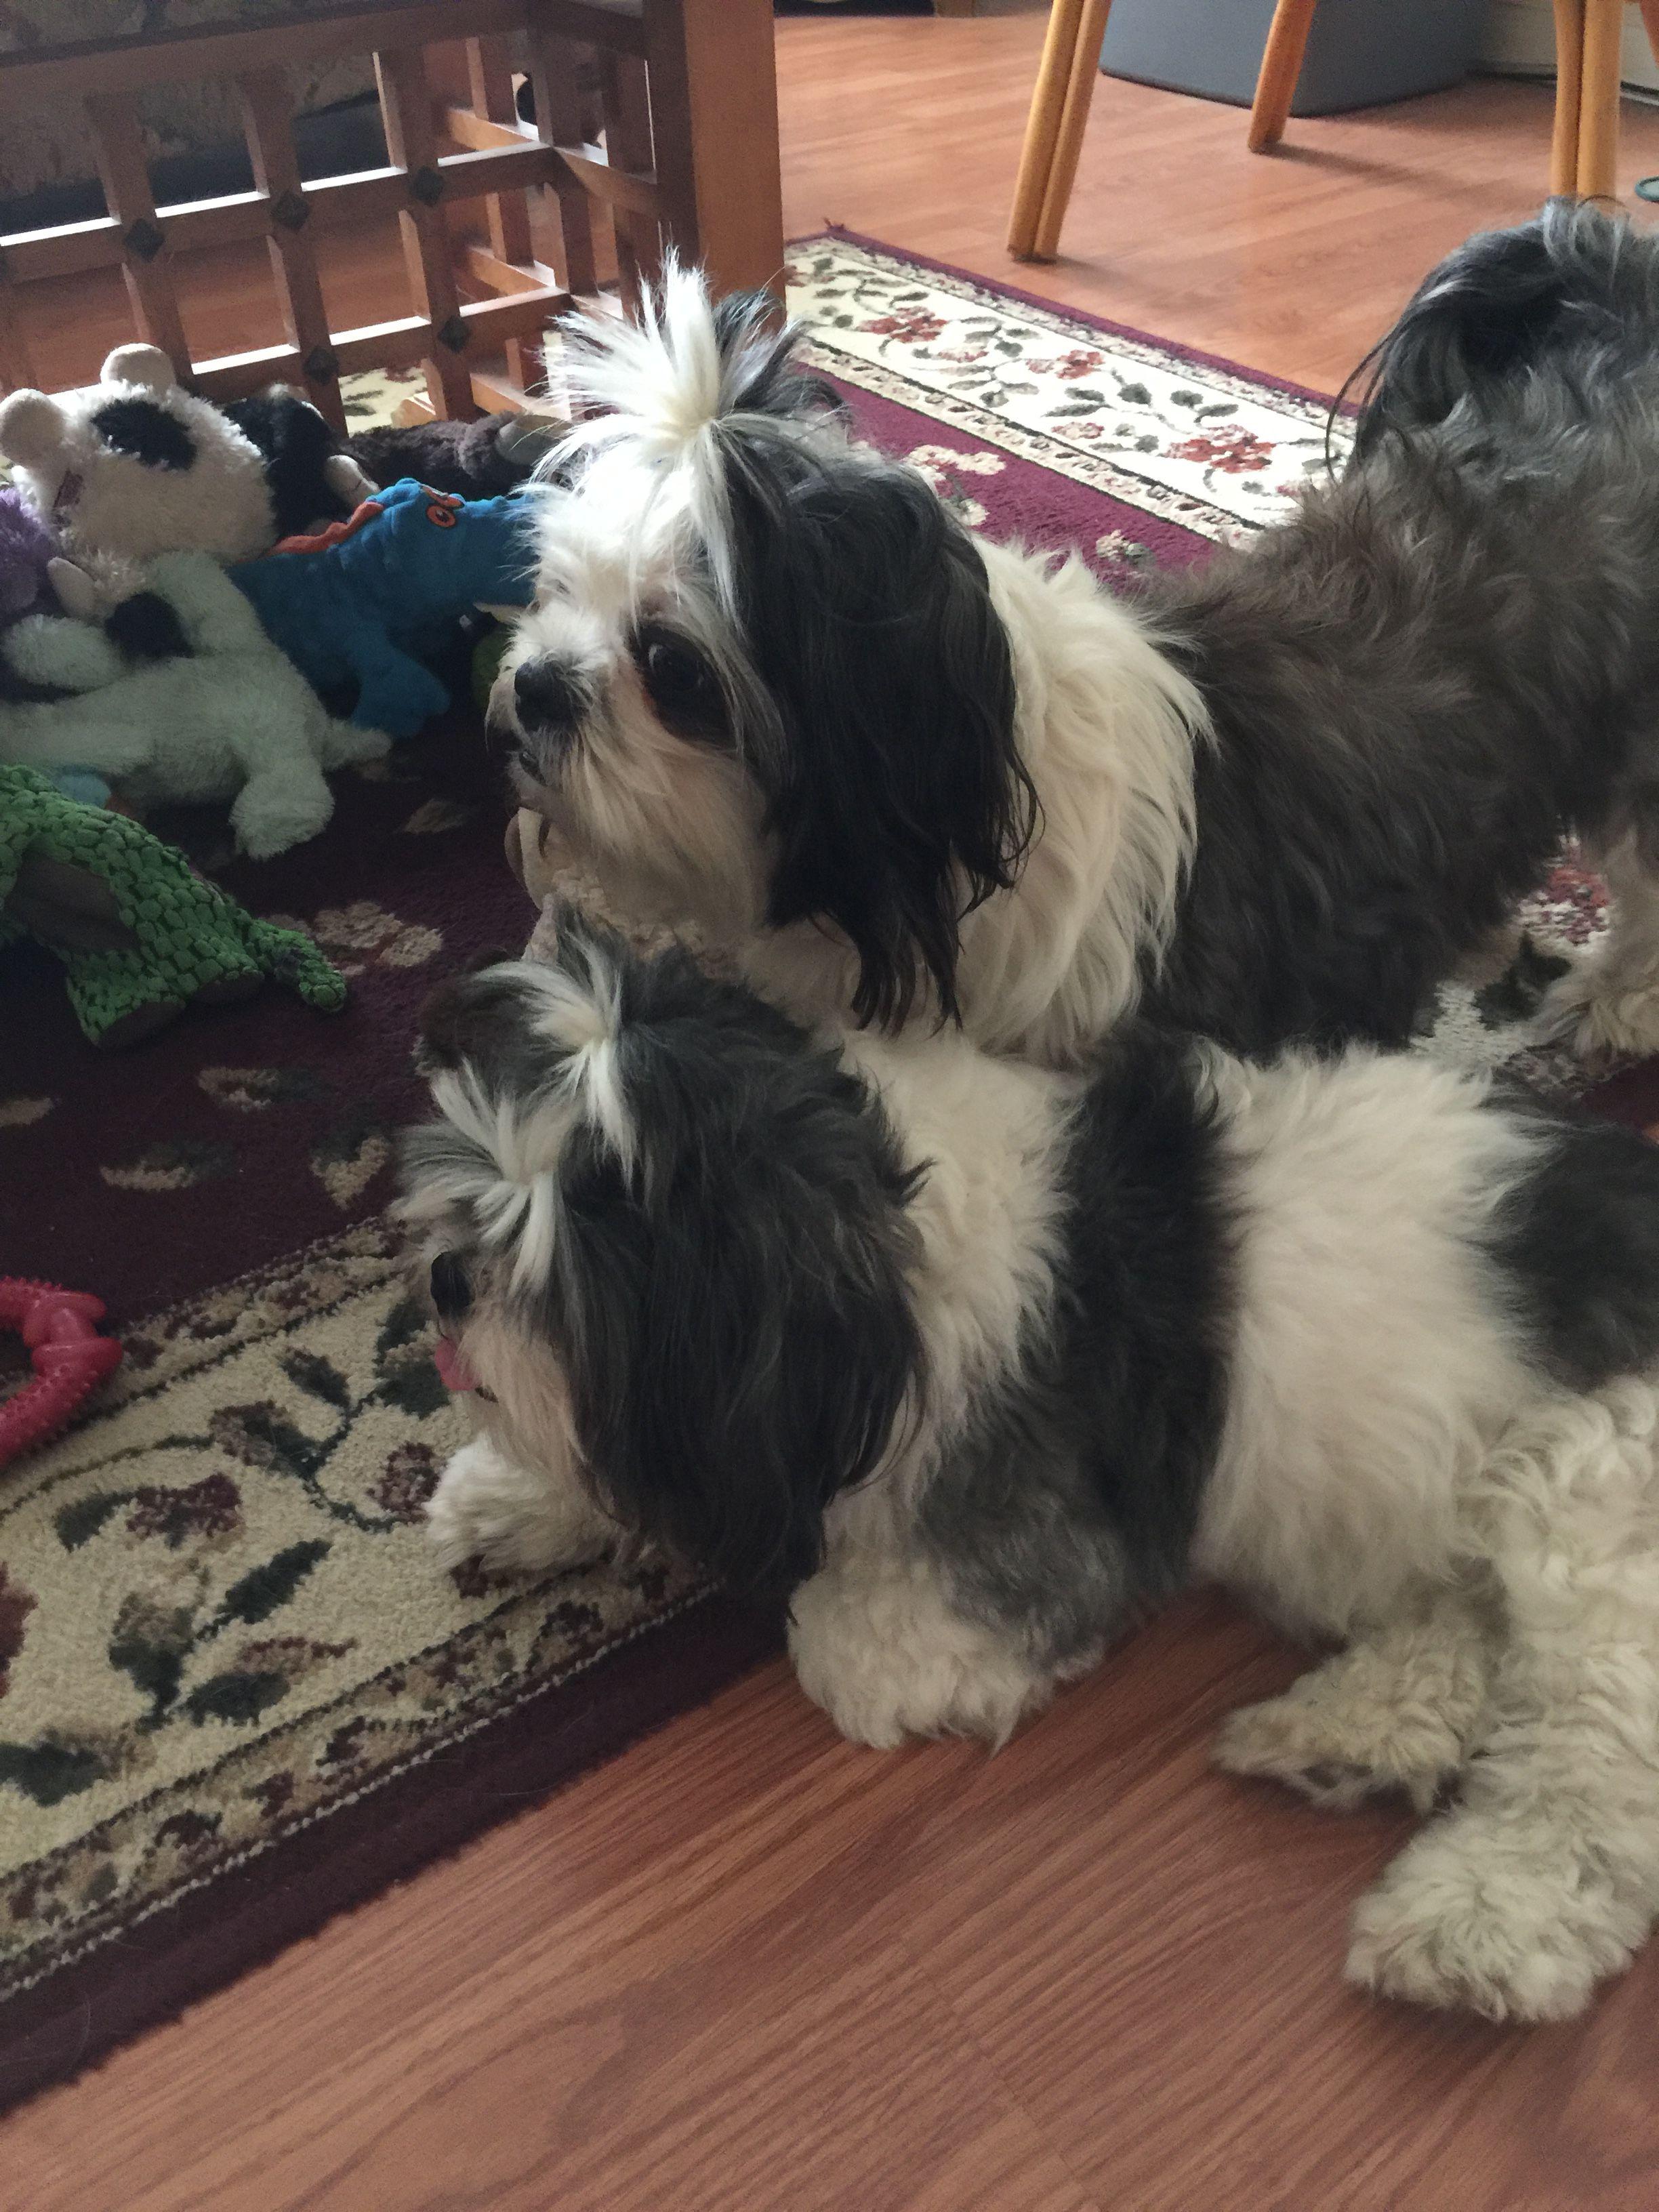 THETINCAT | Pet safe, Newyear, Happy new year  |Shitzu Puppies New Years Eve